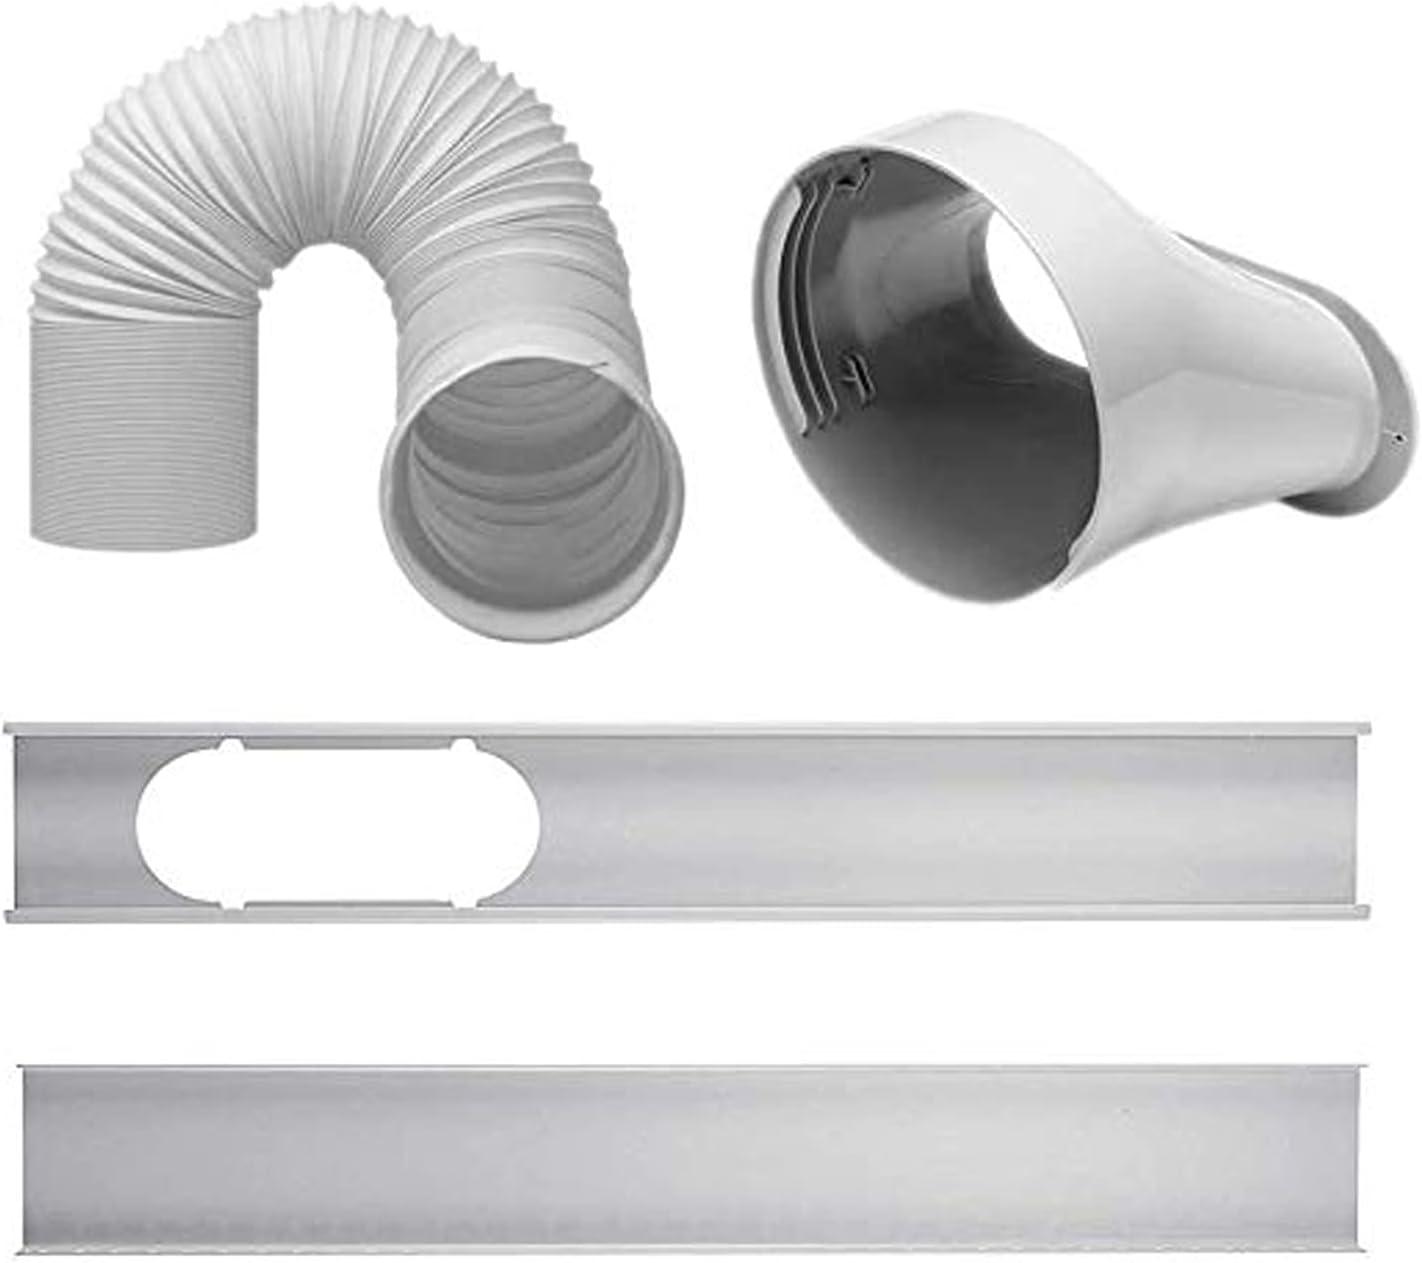 ICRPSTU Air Finally resale start Los Angeles Mall Conditioner Accessories Set Kit 2Pcs Window Slide P